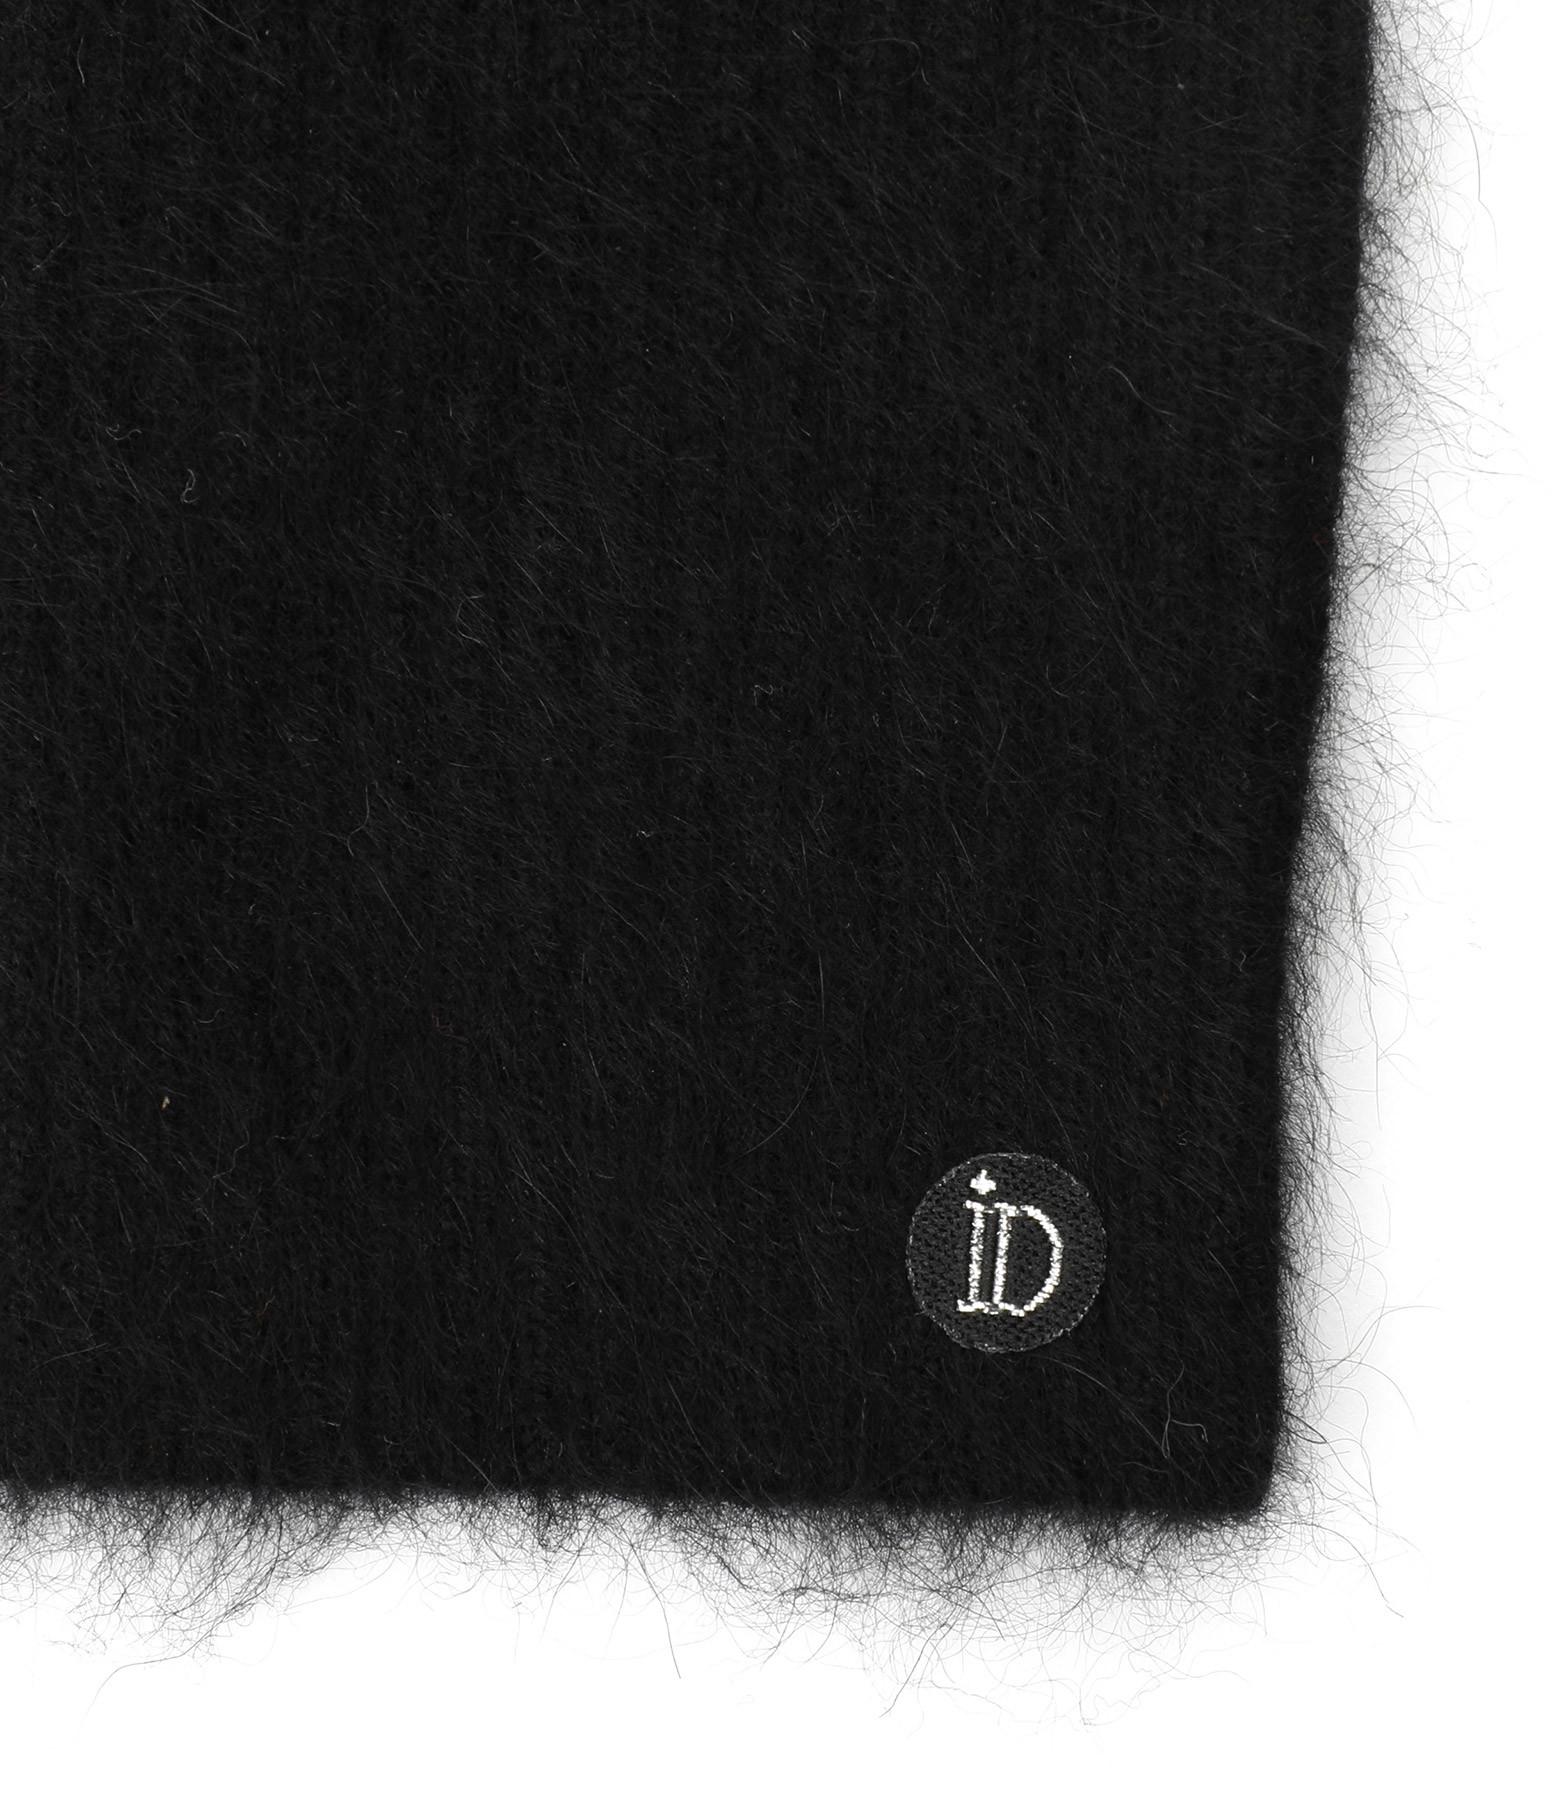 IDADEG - Mitaines Serge Chachemire Vison Noir